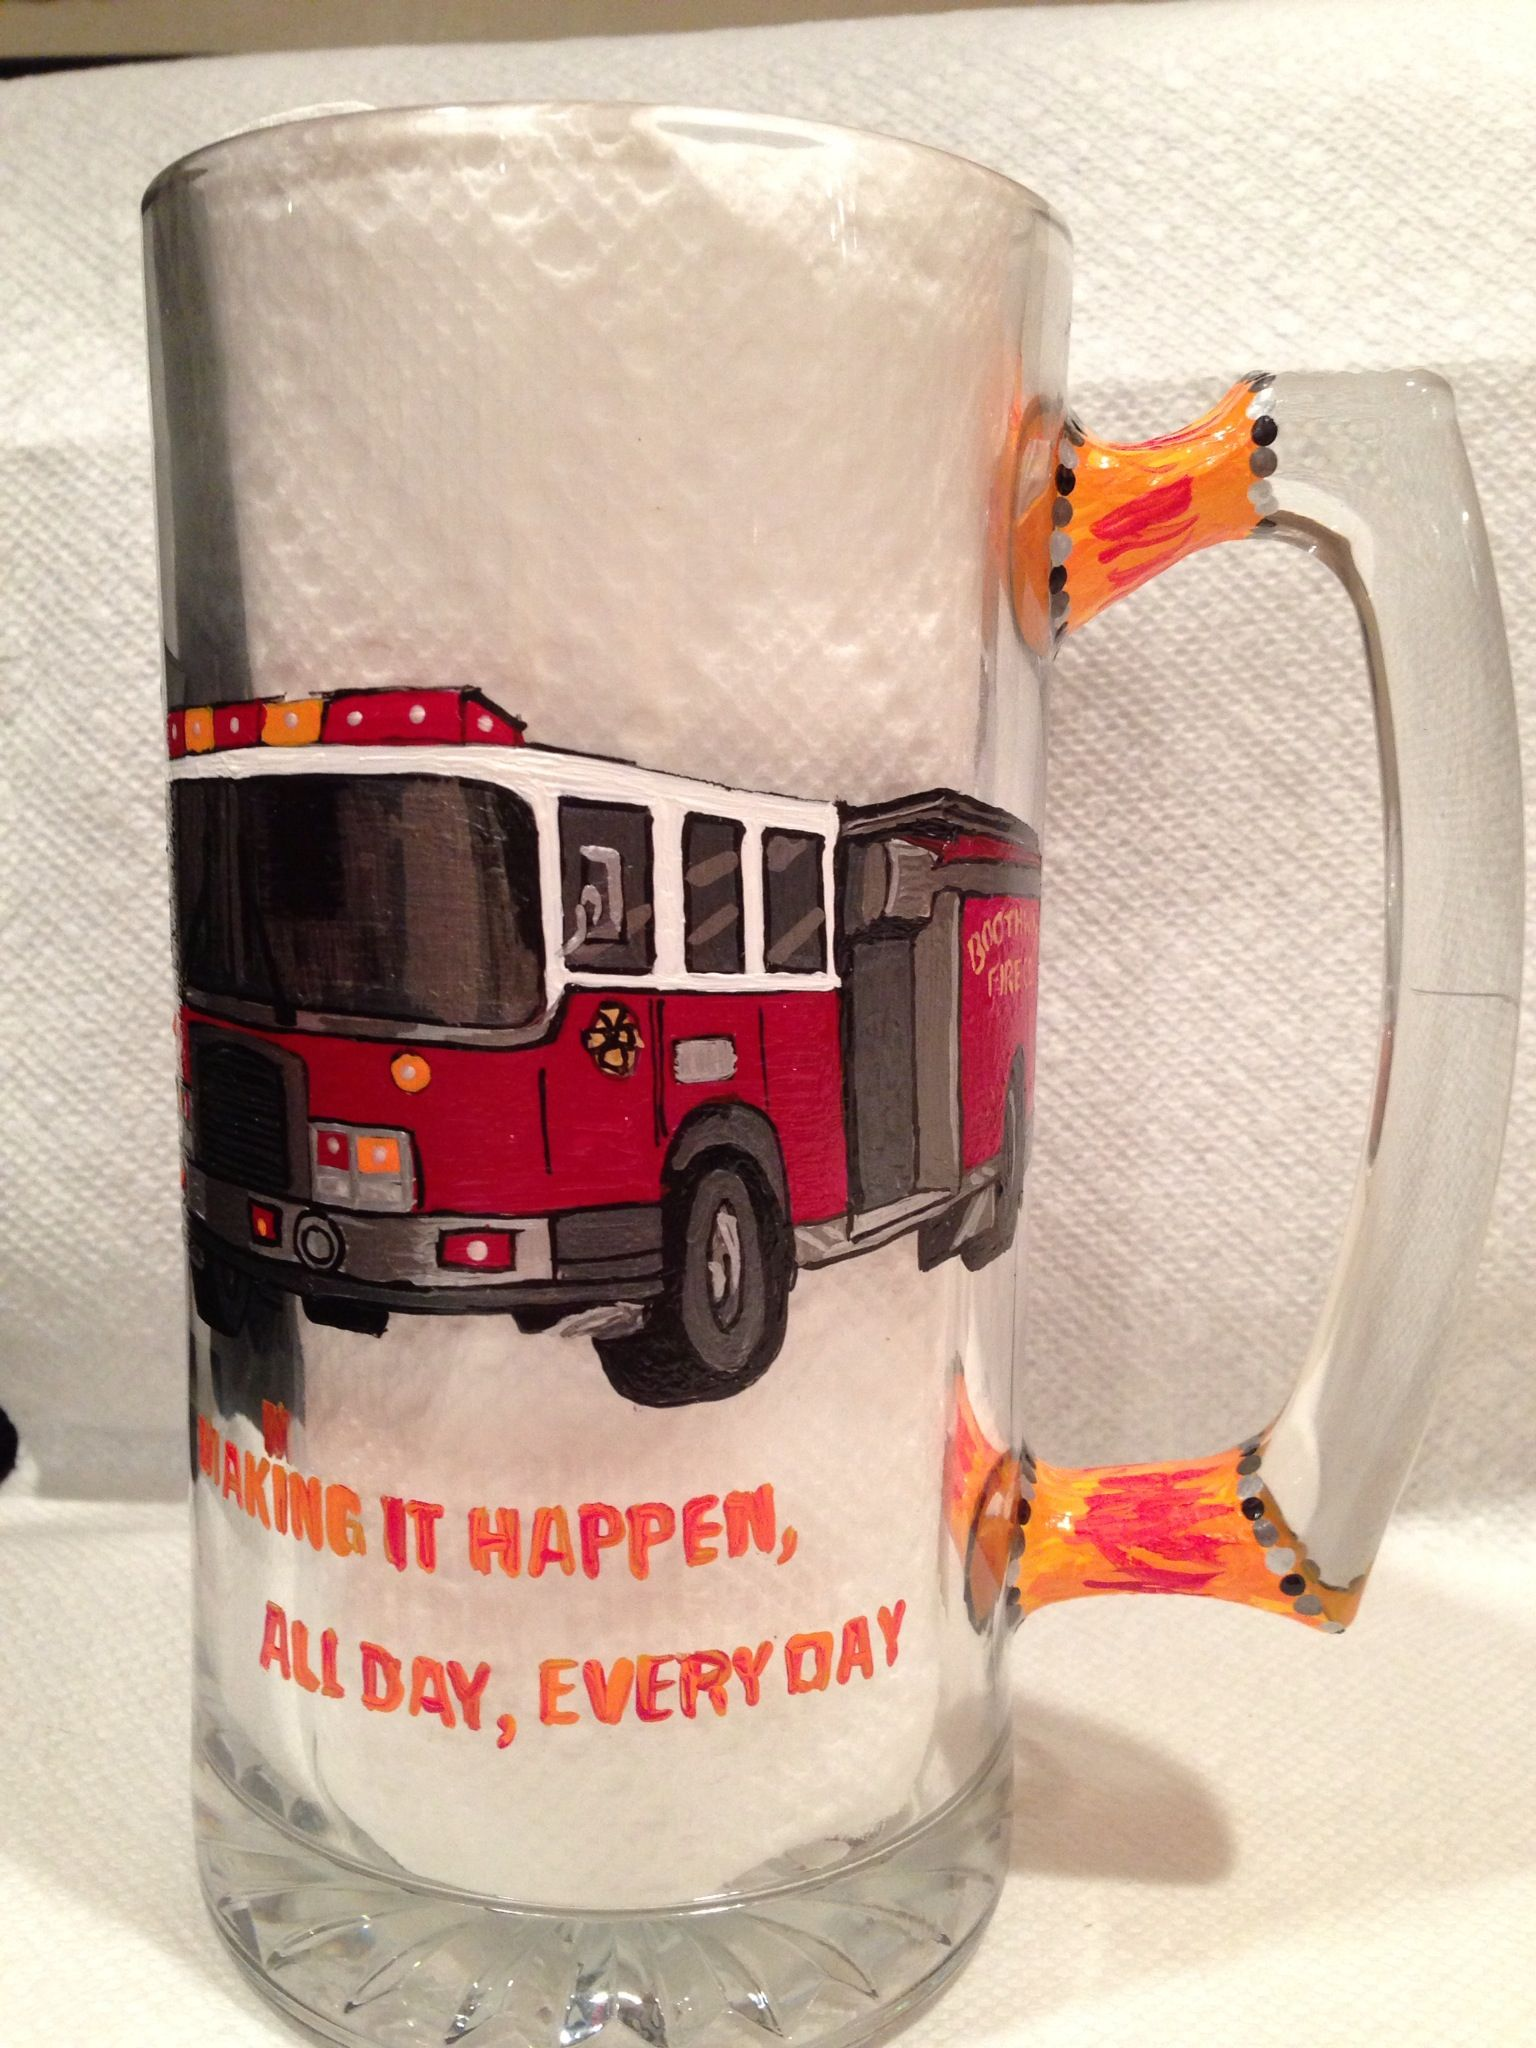 Fireman Hand Painted Glassware Www Lizzymagsdg Com Painting Glassware Hand Painted Glassware Wine Glassware